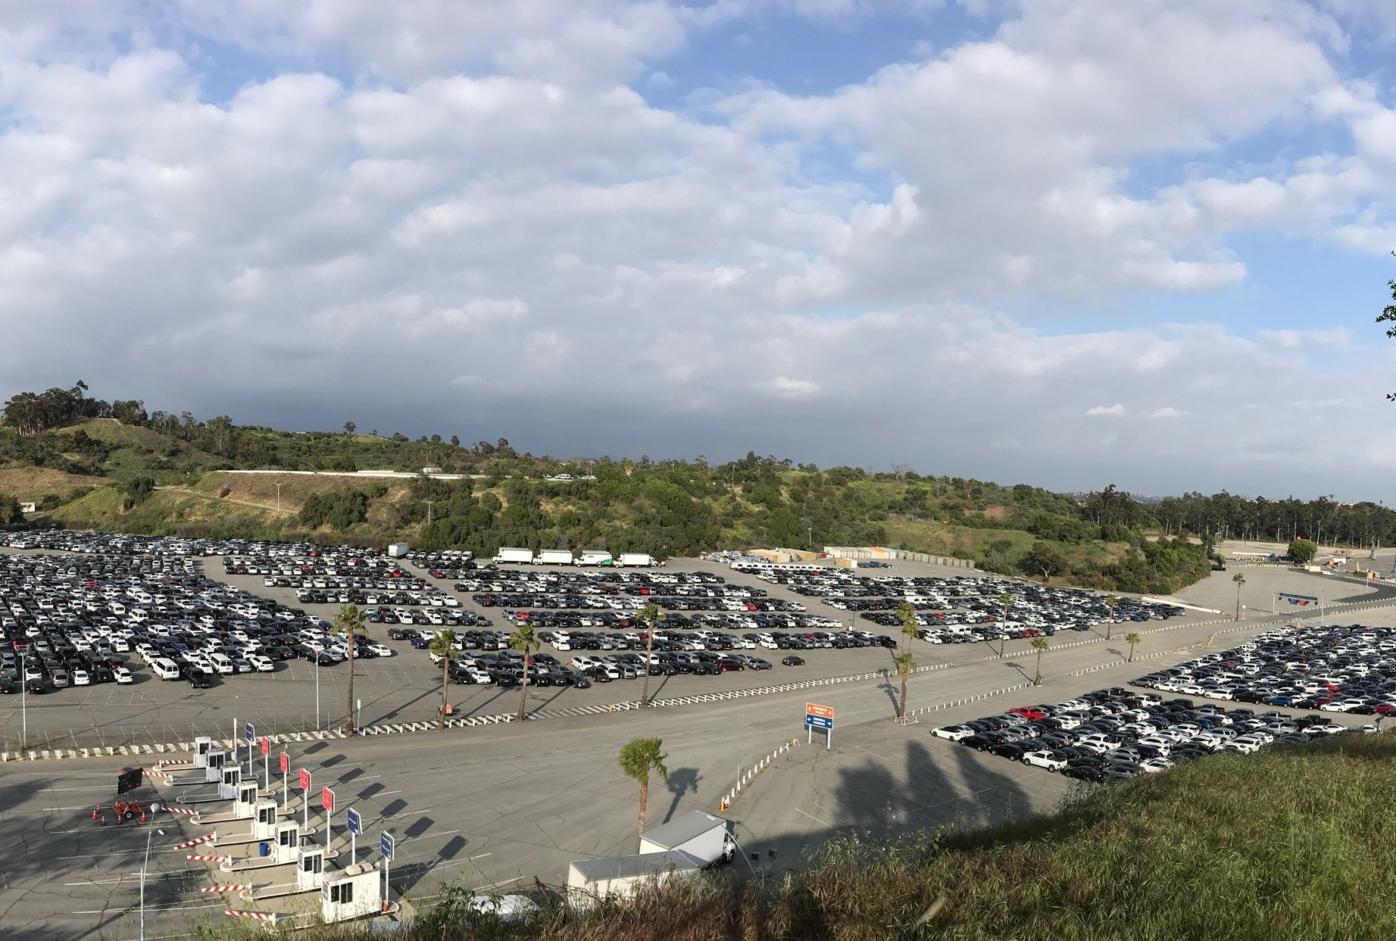 Dodger Stadium Rental Cars April 6 MAK.JPG